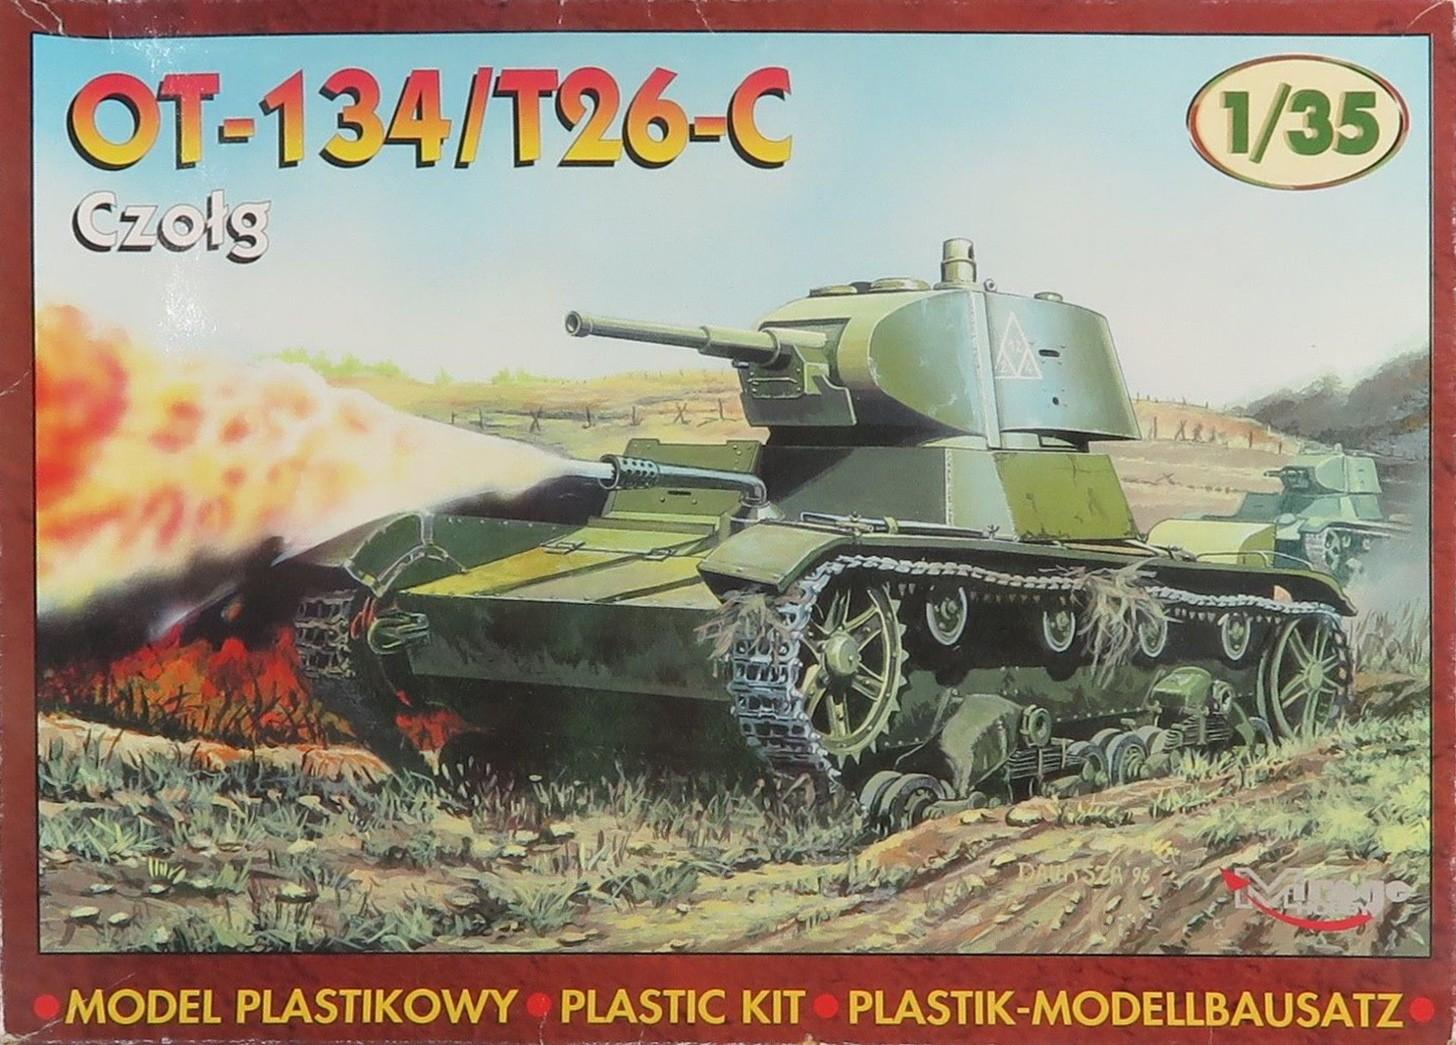 35309 Tank OT-134 / T26-C Image